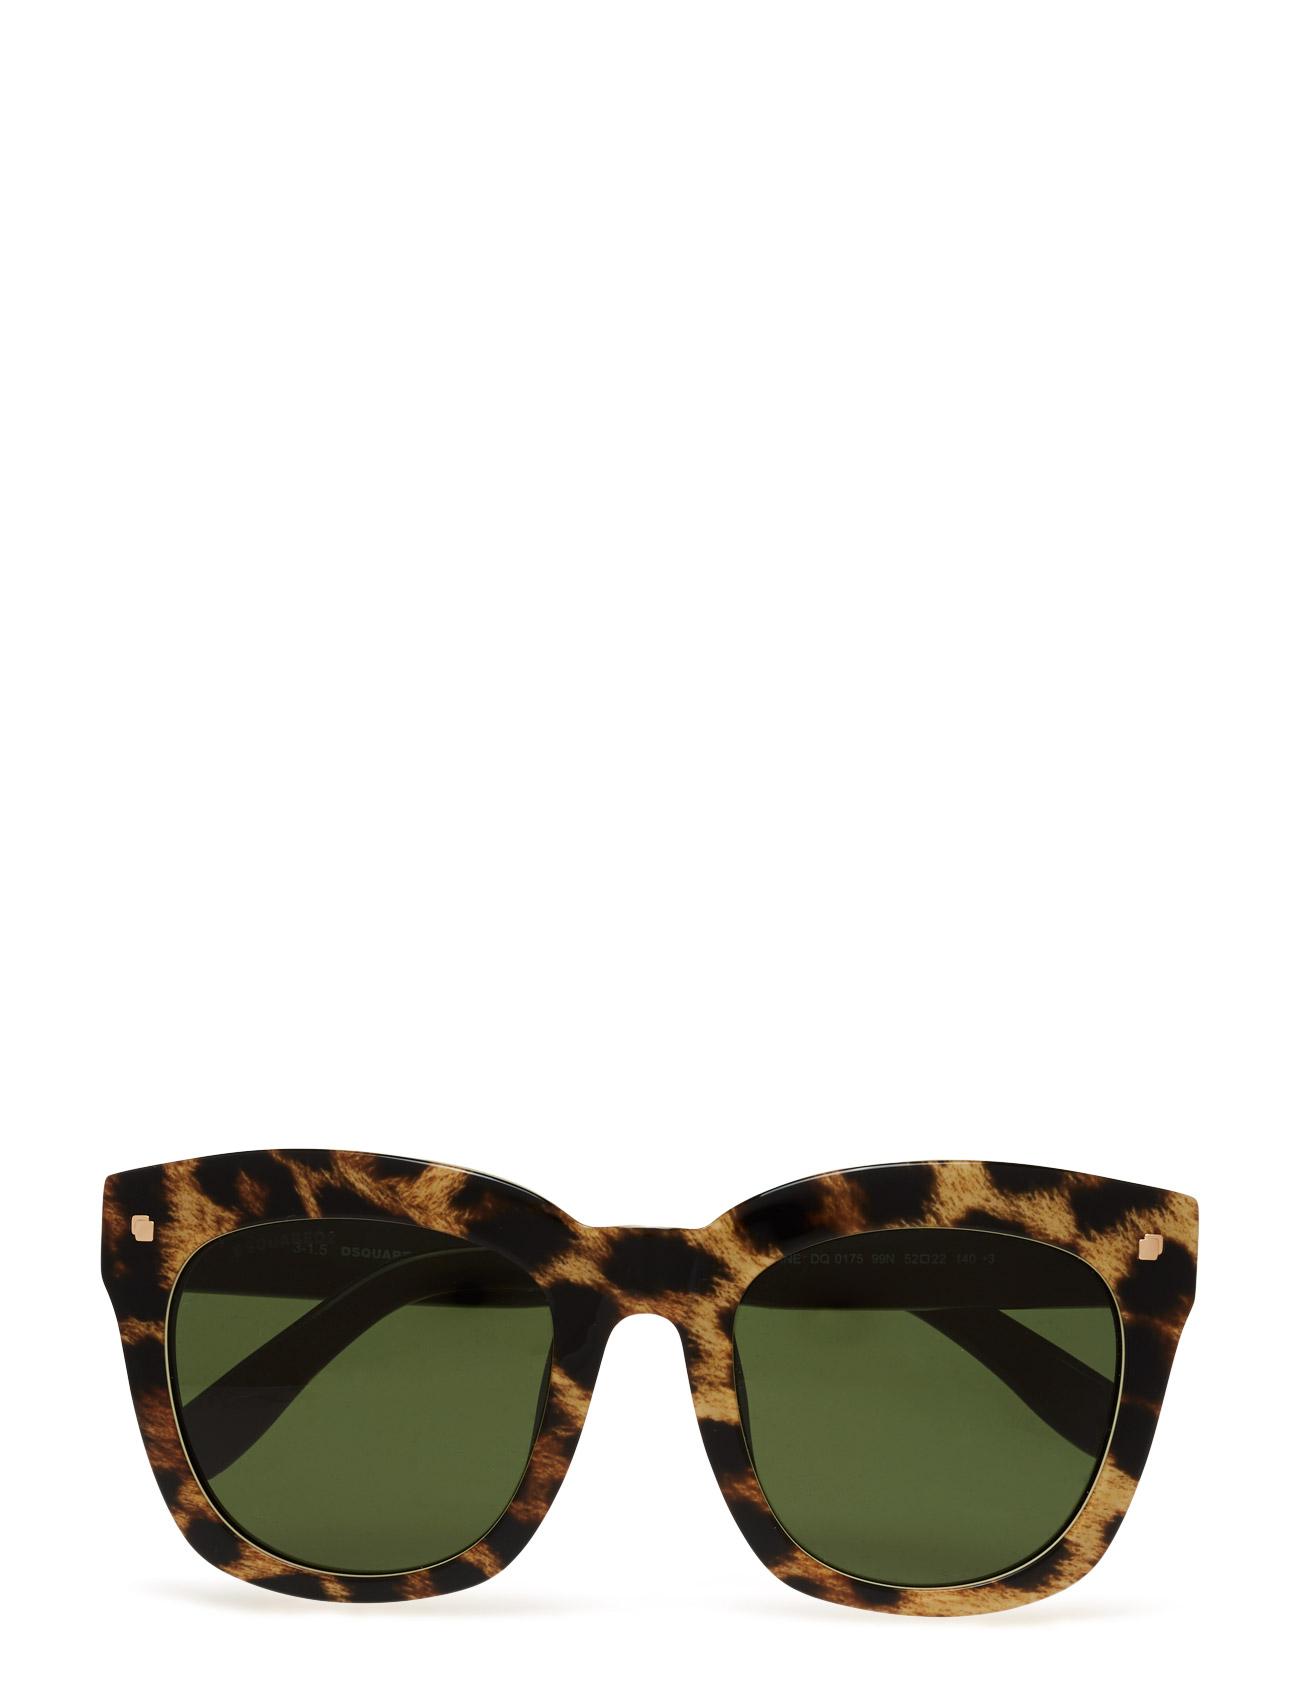 Dq0175 DSQUARED2 Sunglasses Solbriller til Damer i